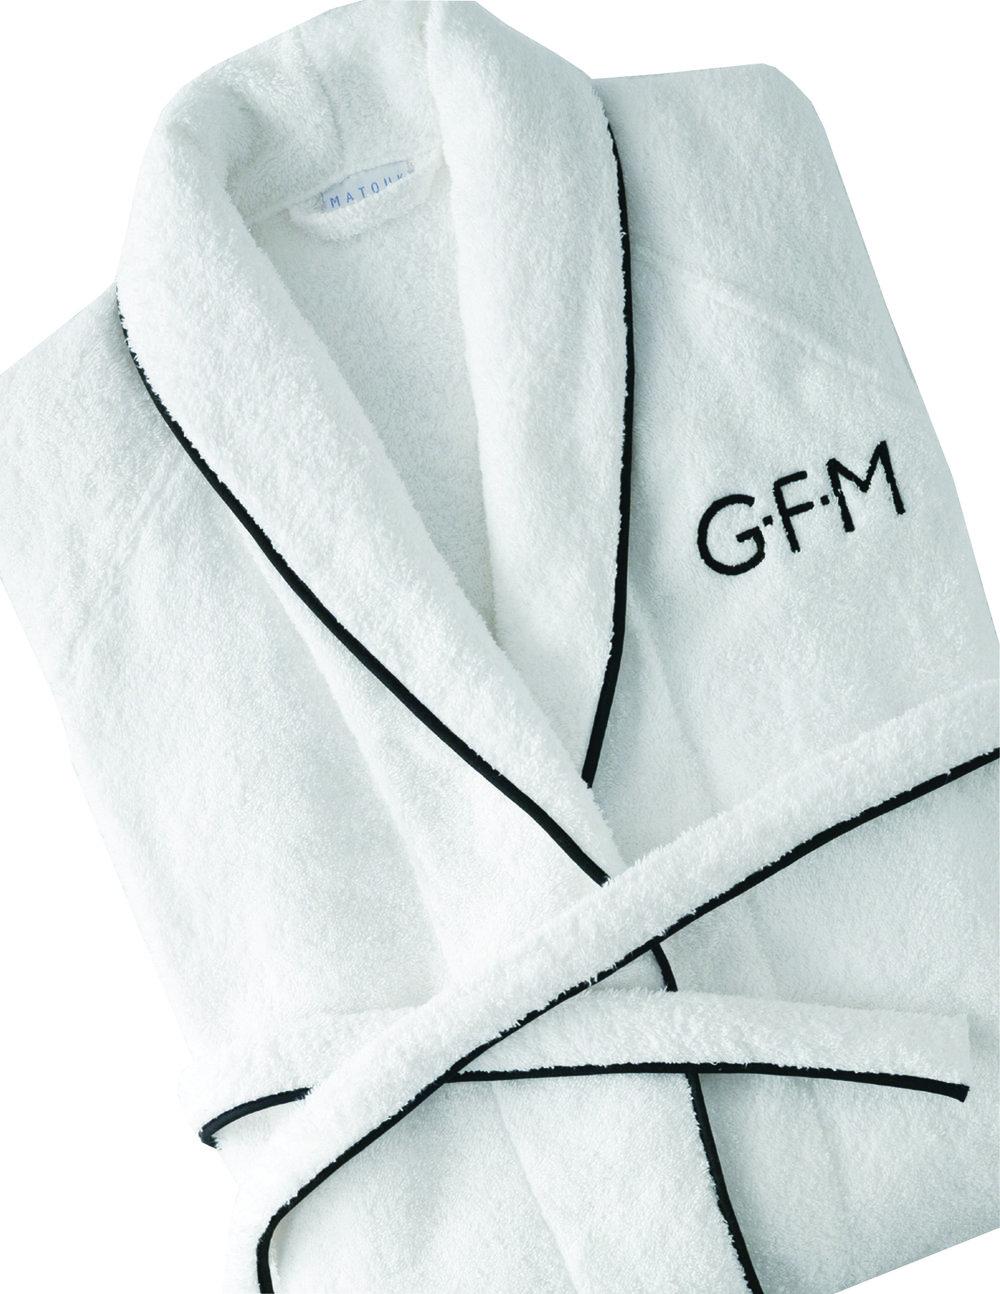 cairo robe, available at matouk